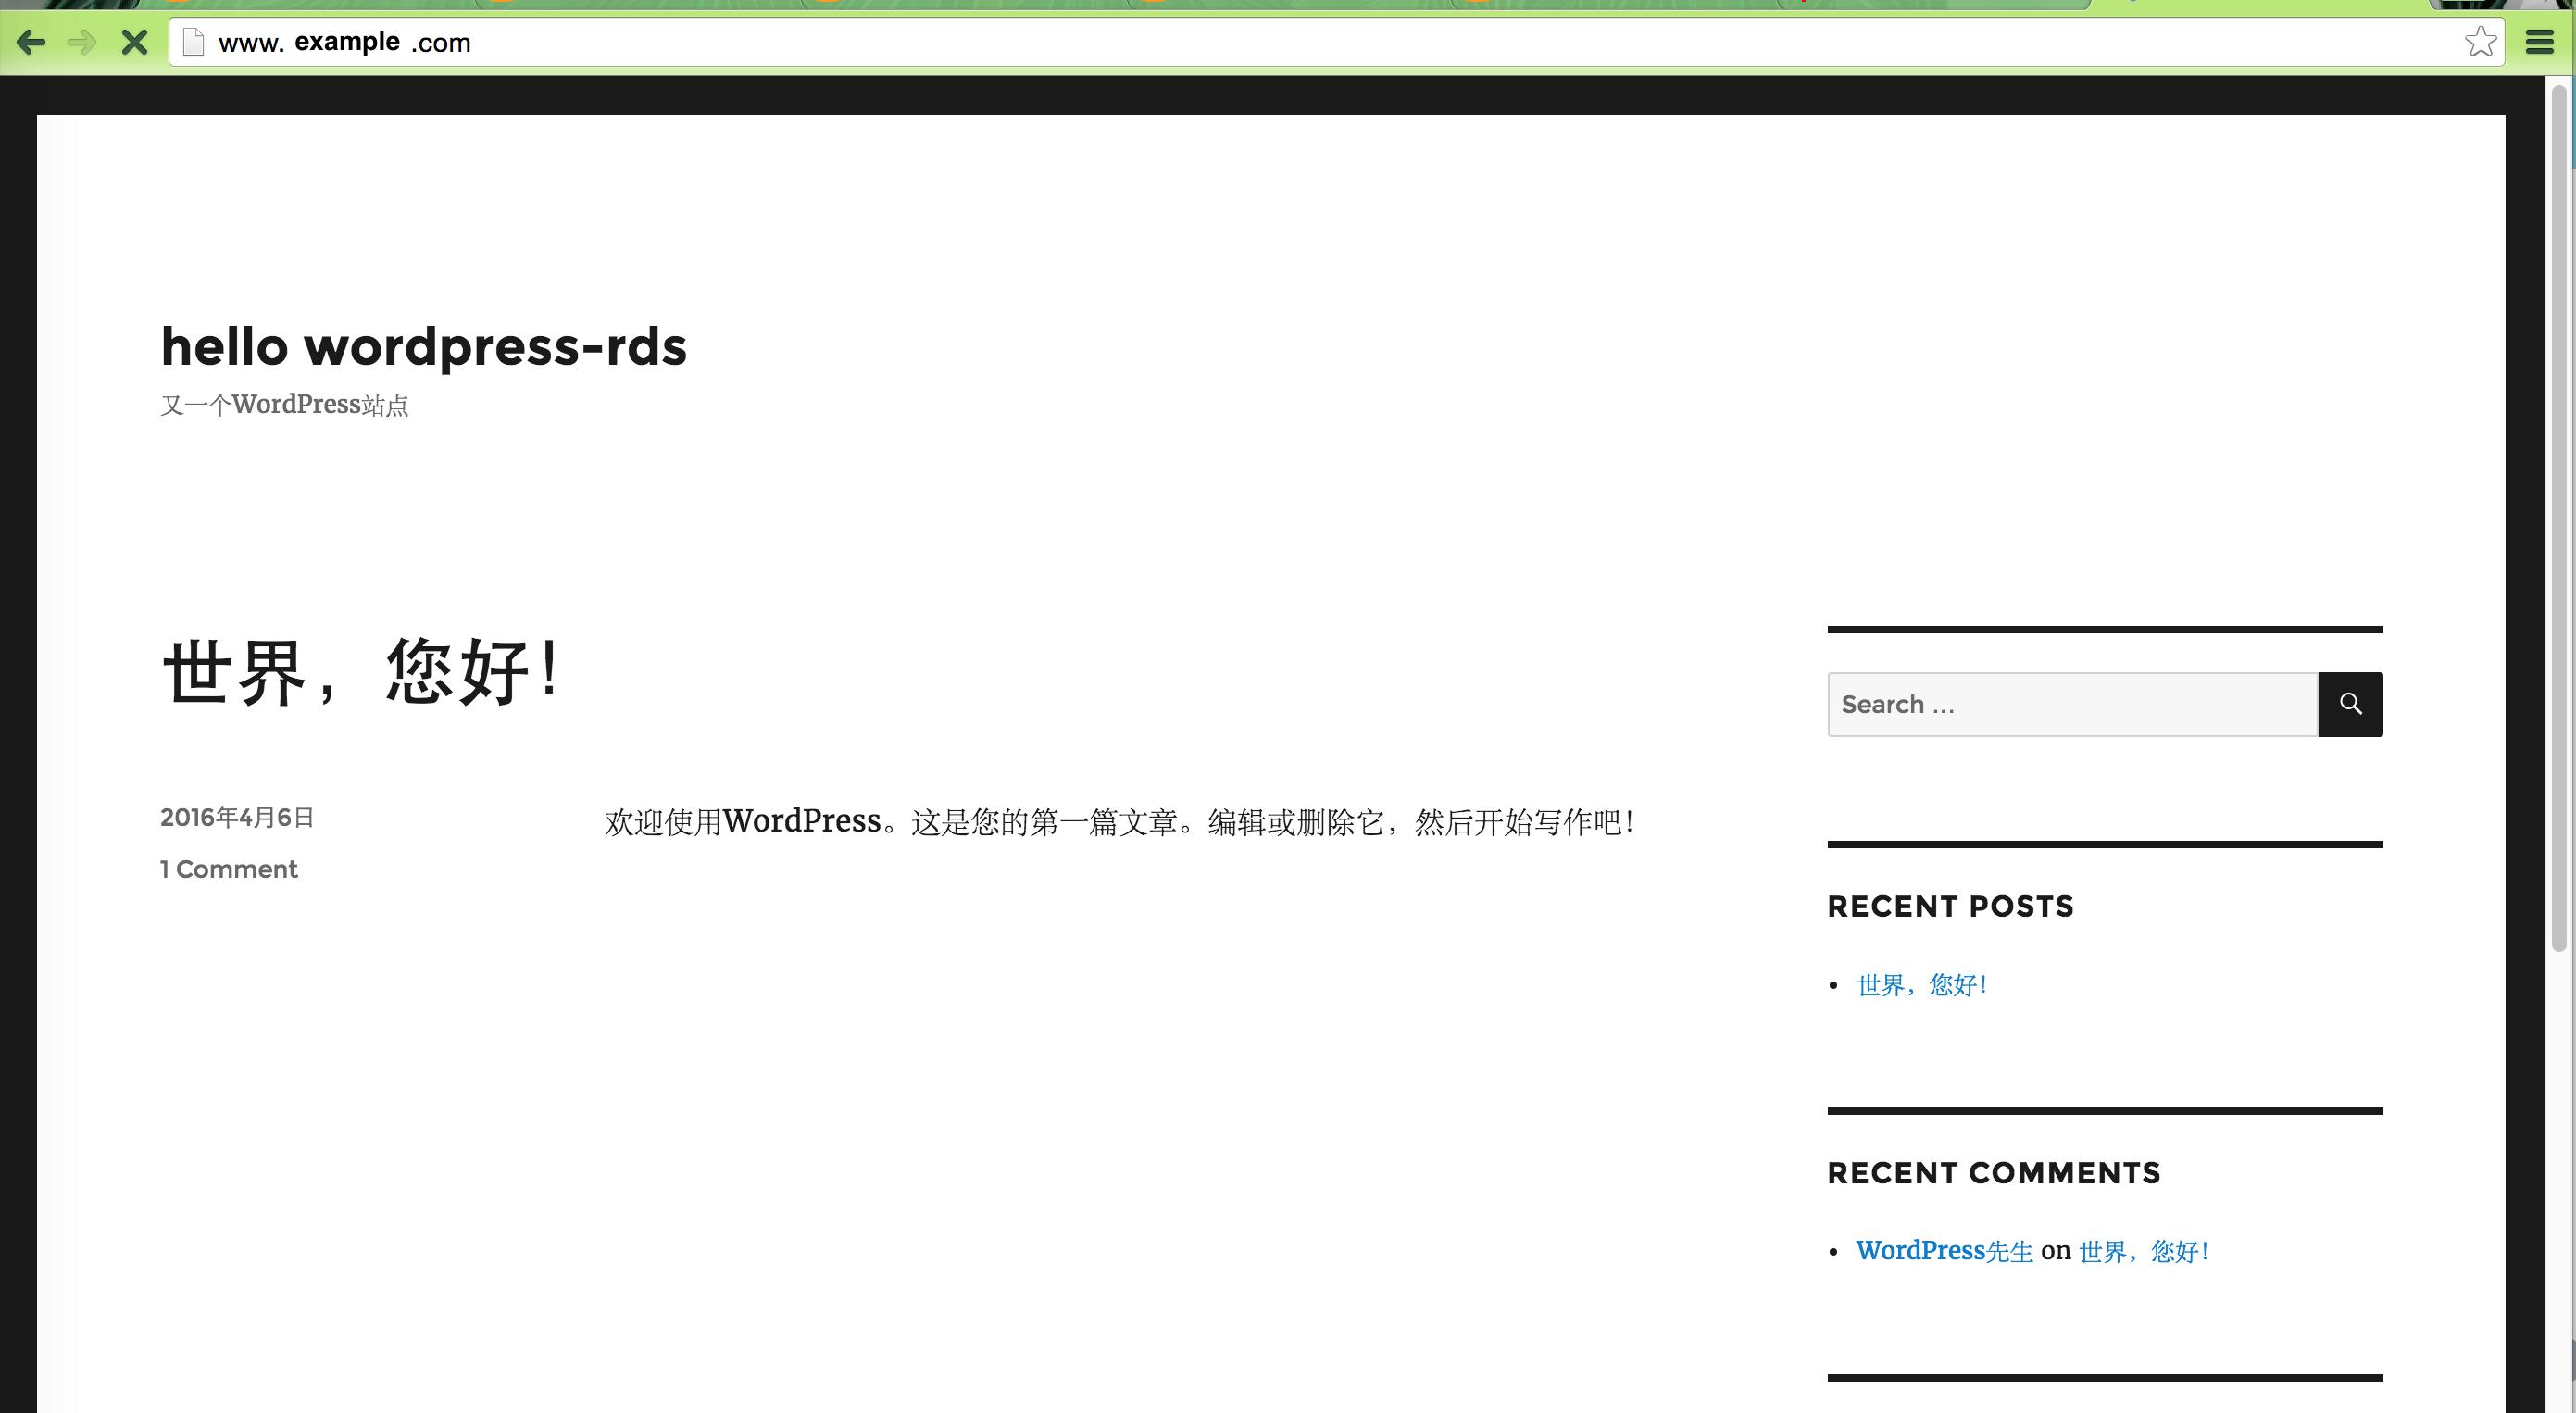 wordpress-rds-访问页面